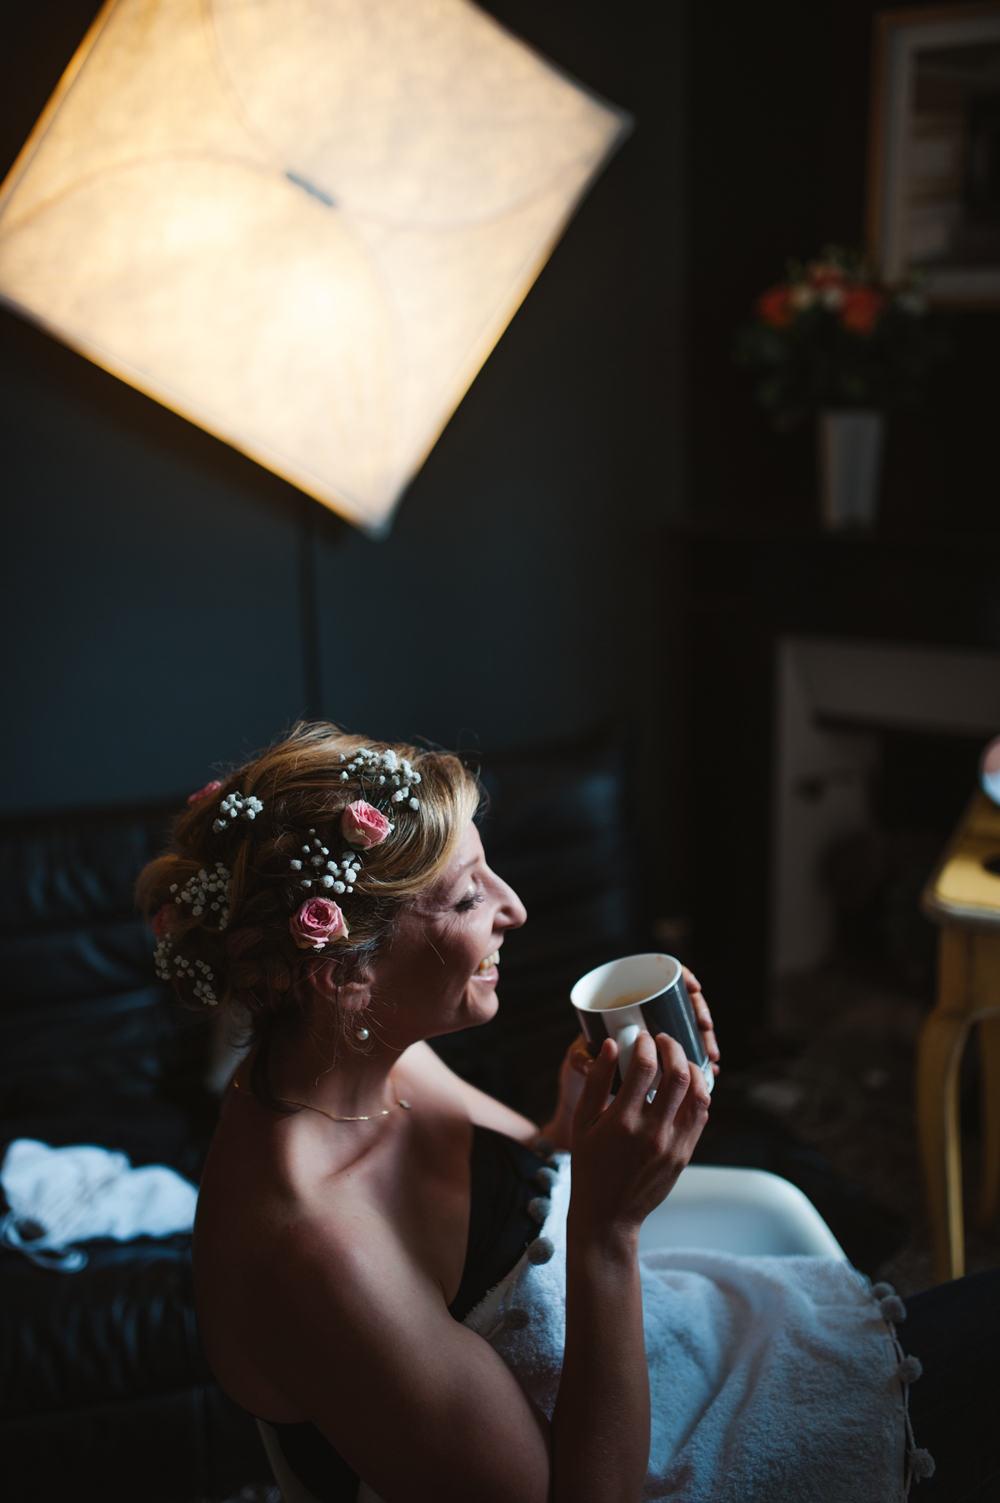 melanie-bultez-photographe-mariage-alternatif-reportage-geneve-205